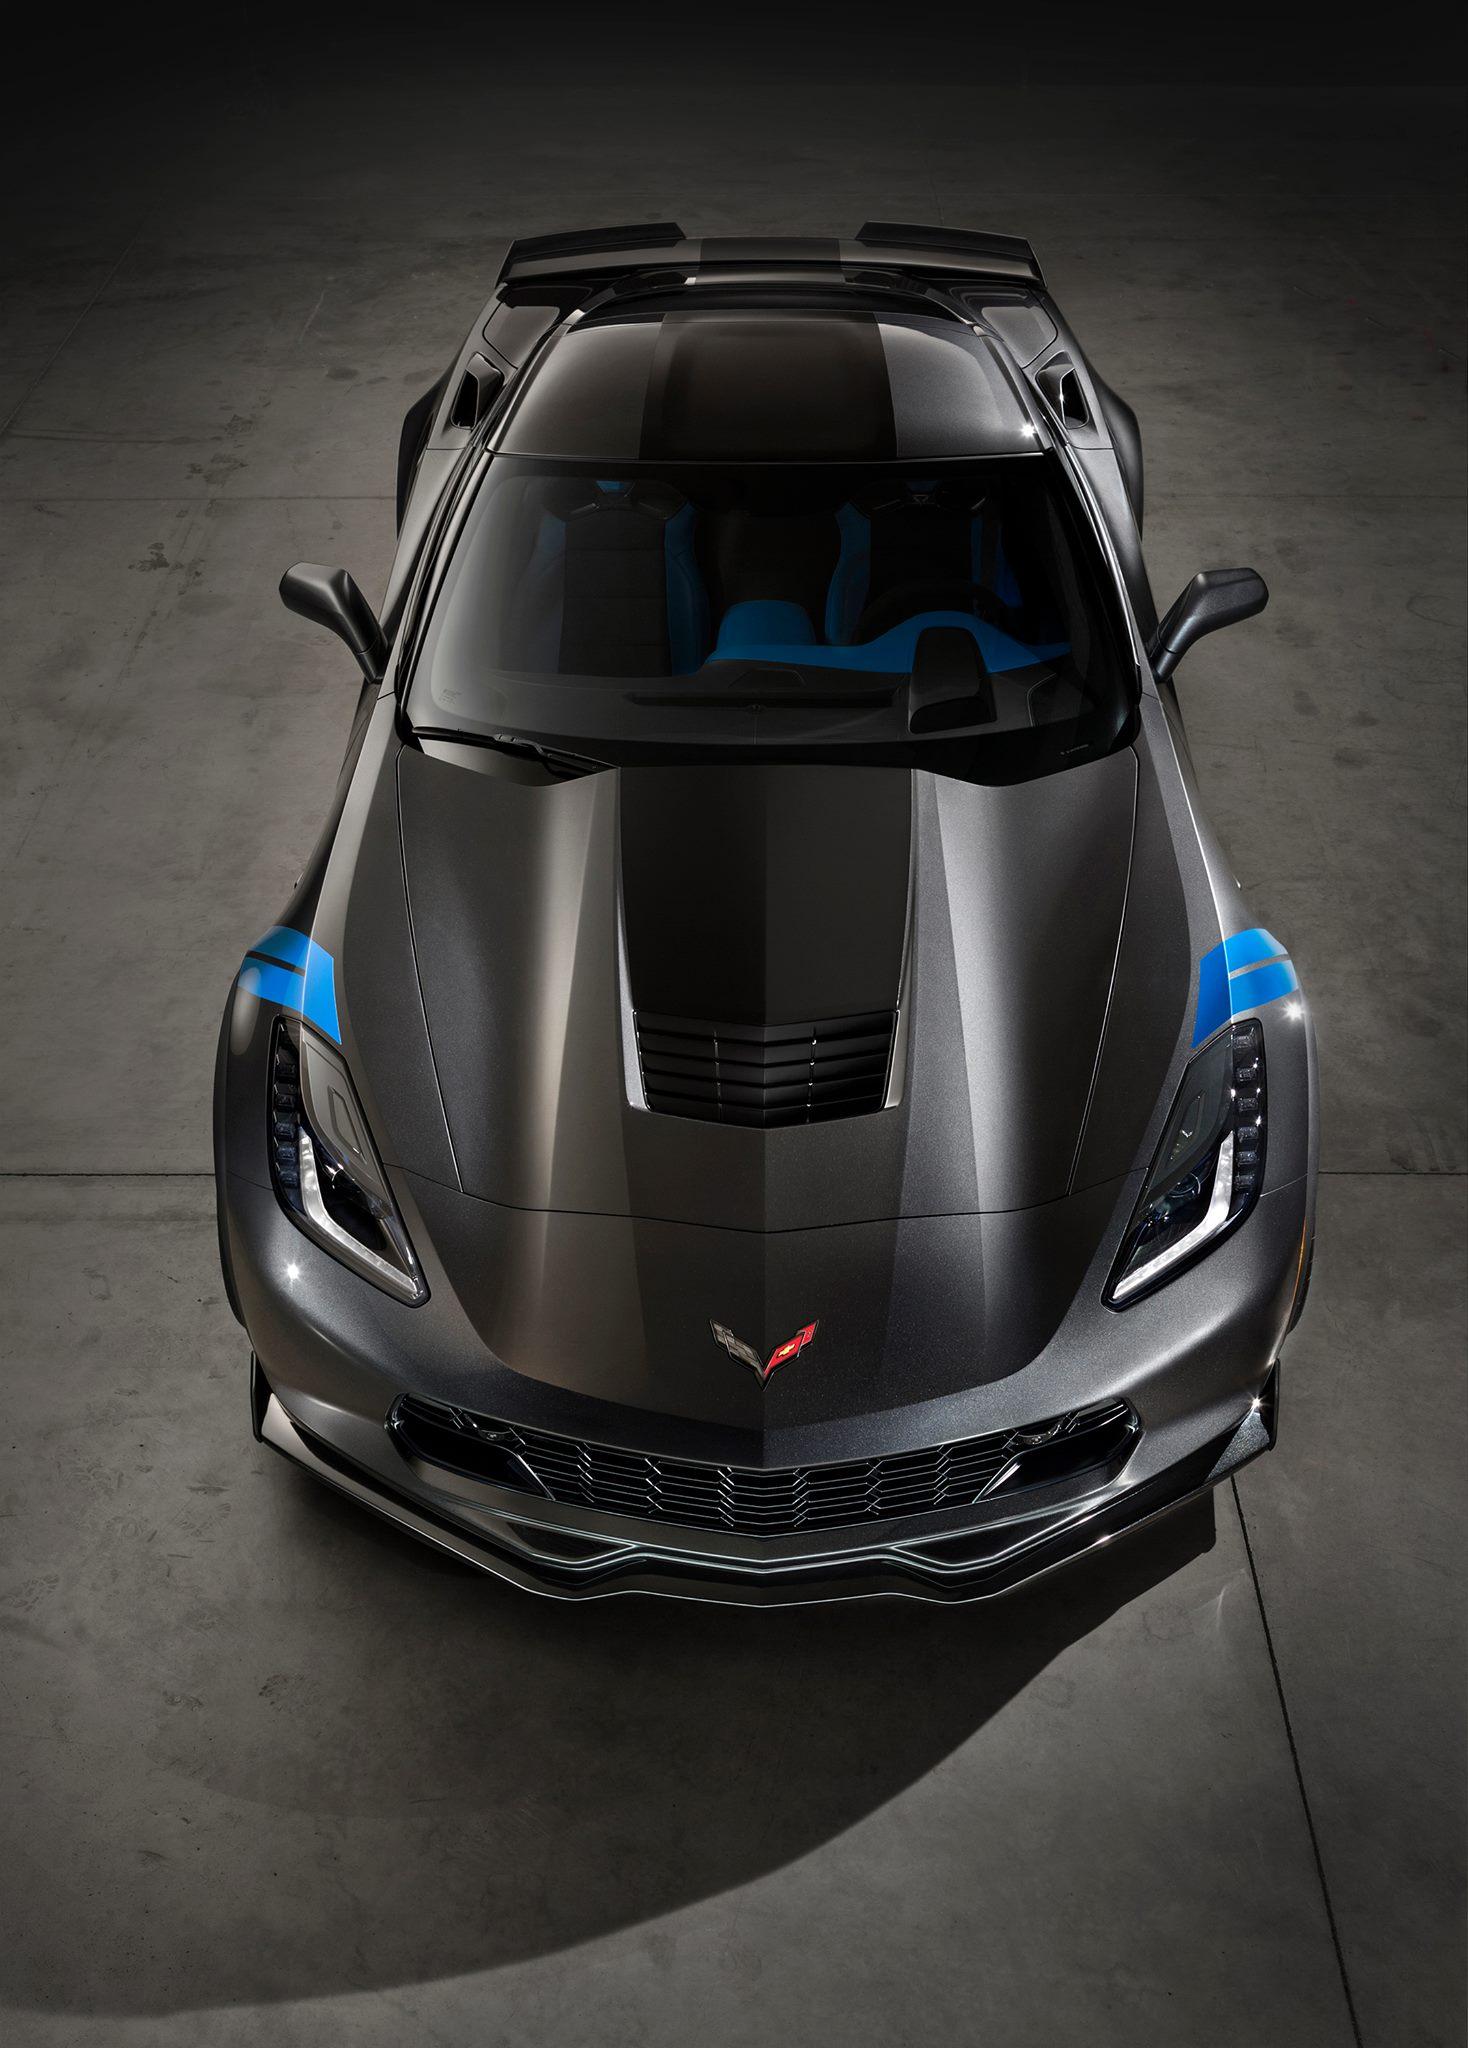 2017 Chevrolet Corvette Grand Sport Top View